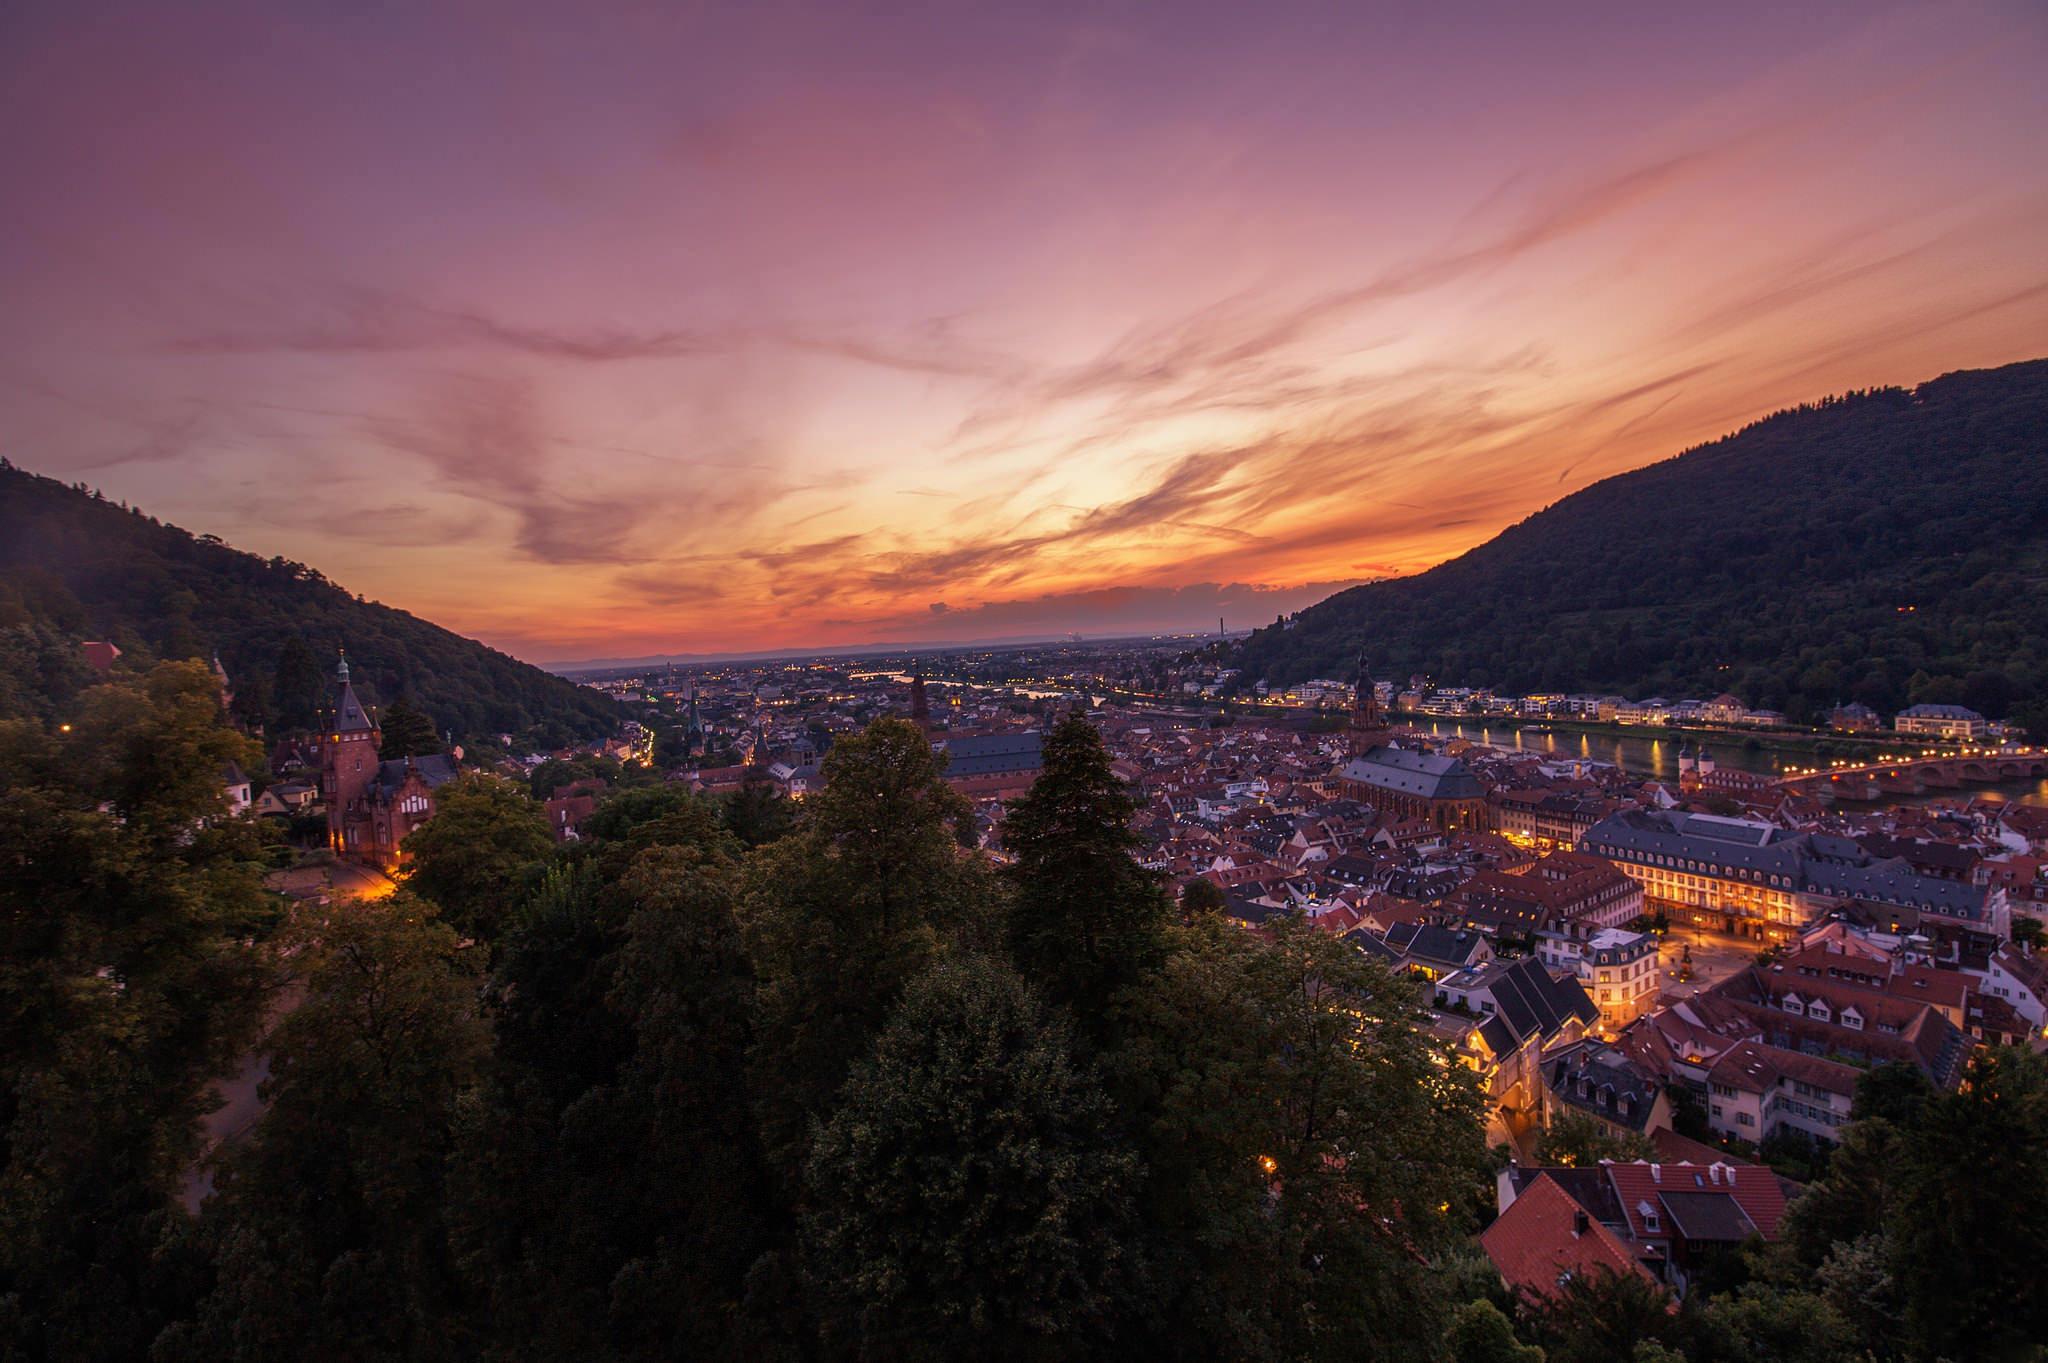 Landschaftsfotografie fotograf filmemacher frankfurt patrick schmetzer drohne landschaft natur 24